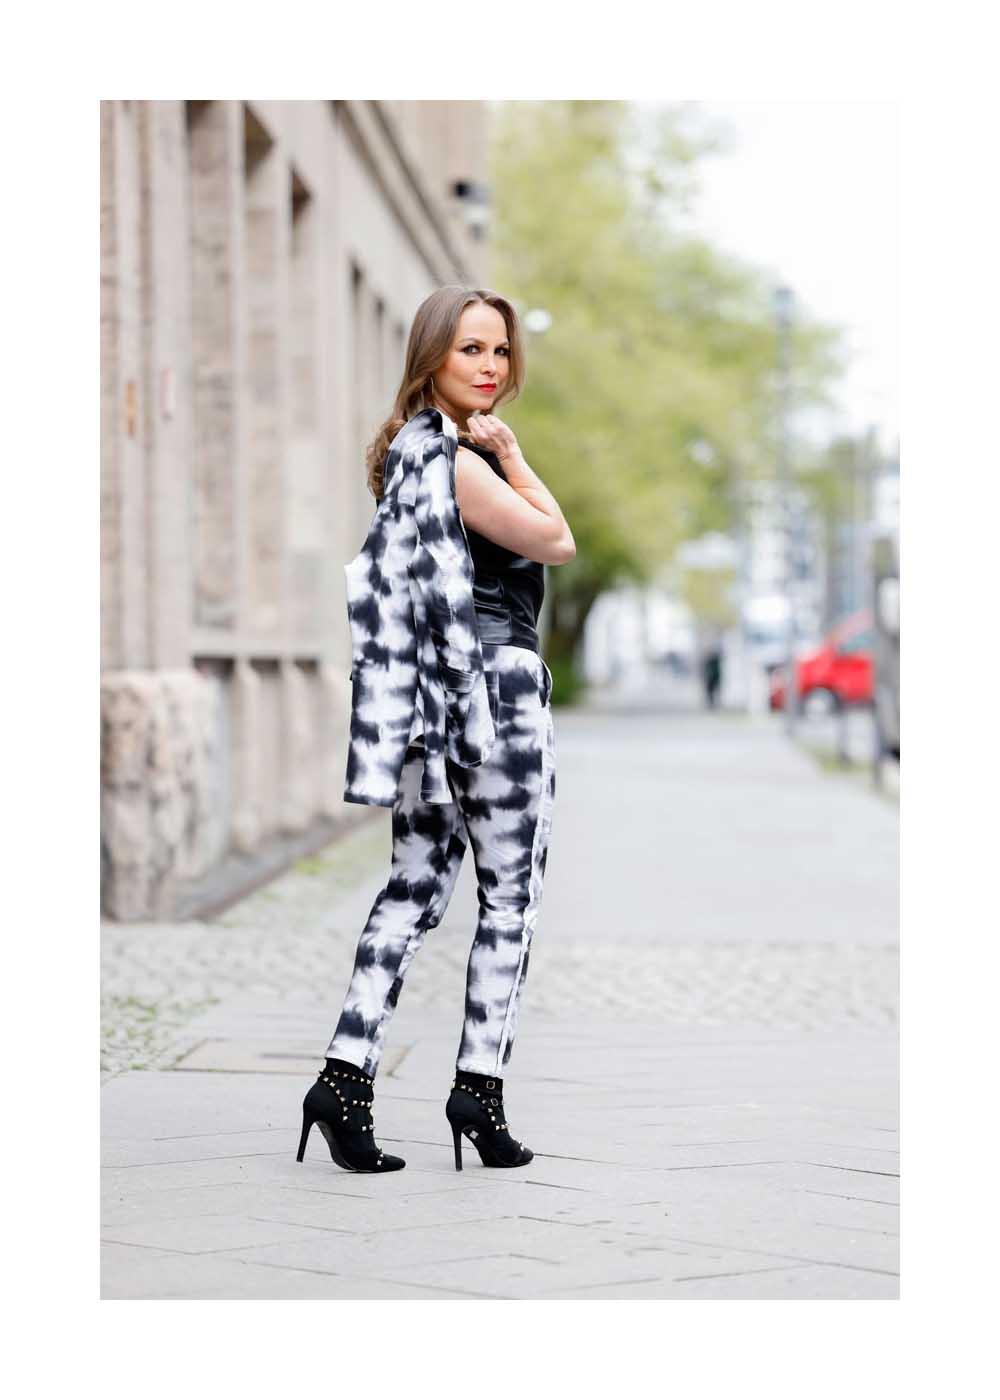 Streetstyle Shooting mit Box-Weltmeisterin Regina Halmich